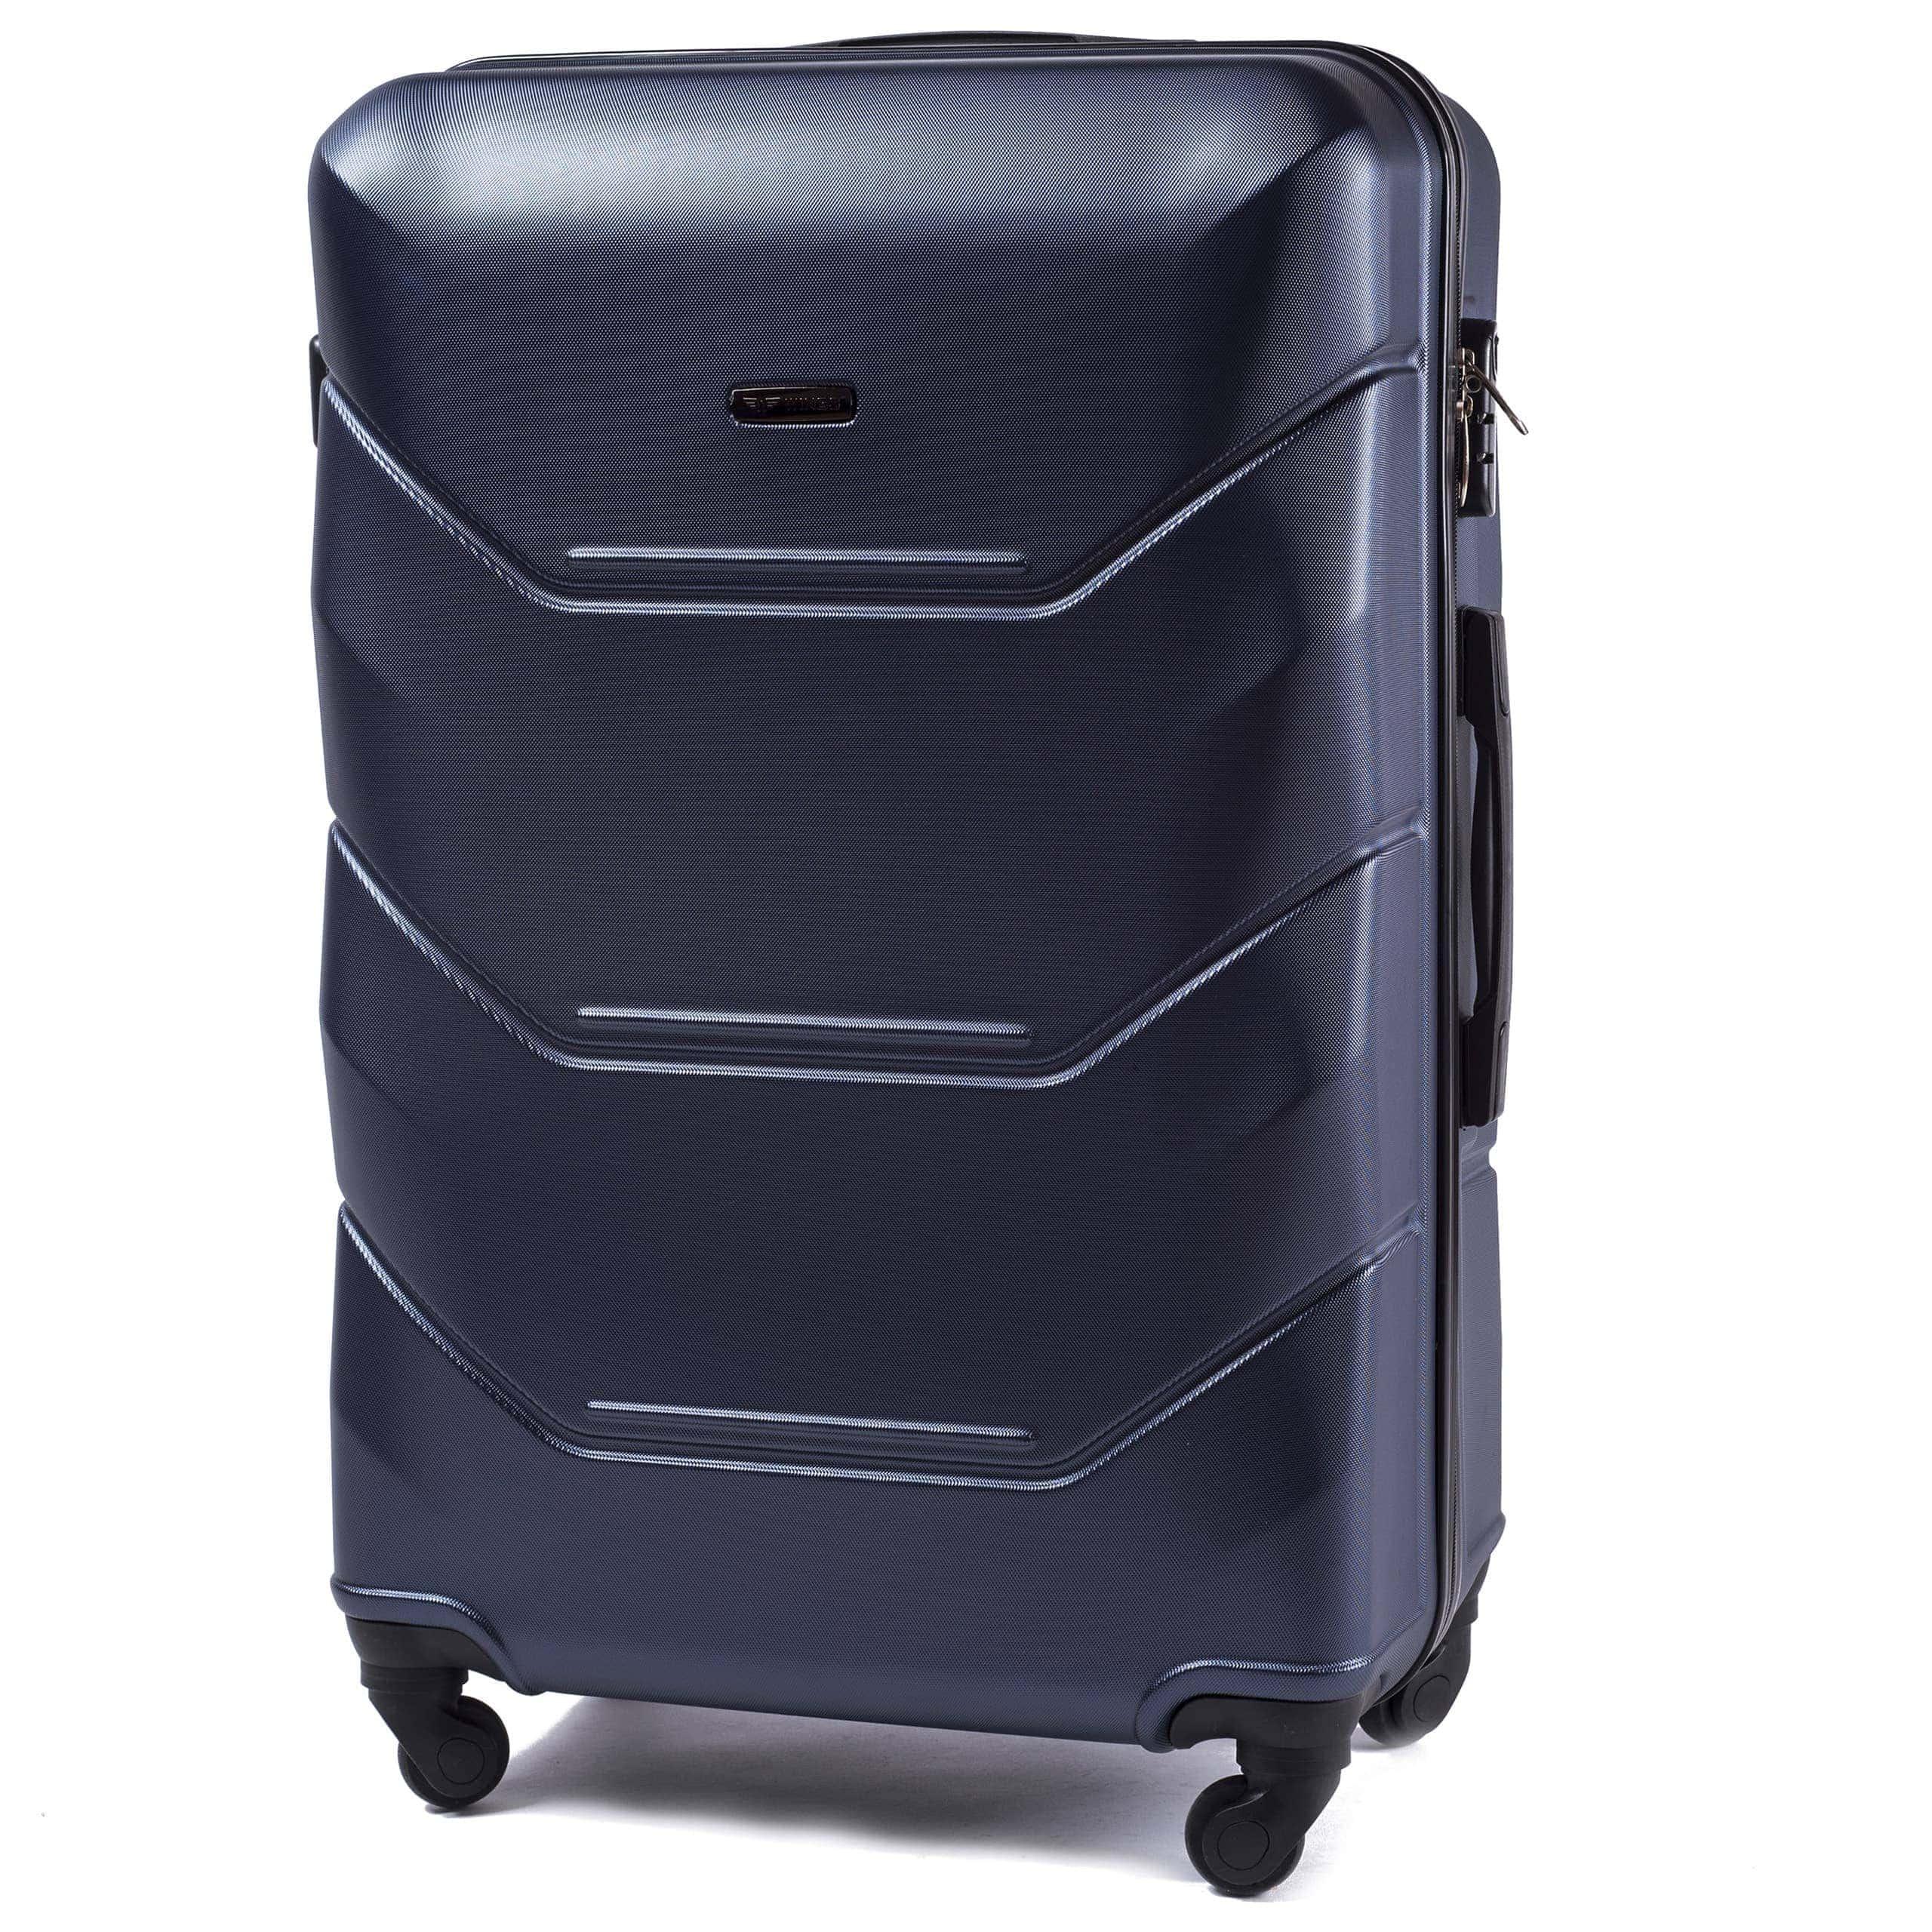 БОЛЬШОЙ ЧЕМОДАН WINGS 147 L Blue PREMIUM НА 4-Х КАУЧУКОВЫХ КОЛЕСАХ!Для багажа ,до 23 кг